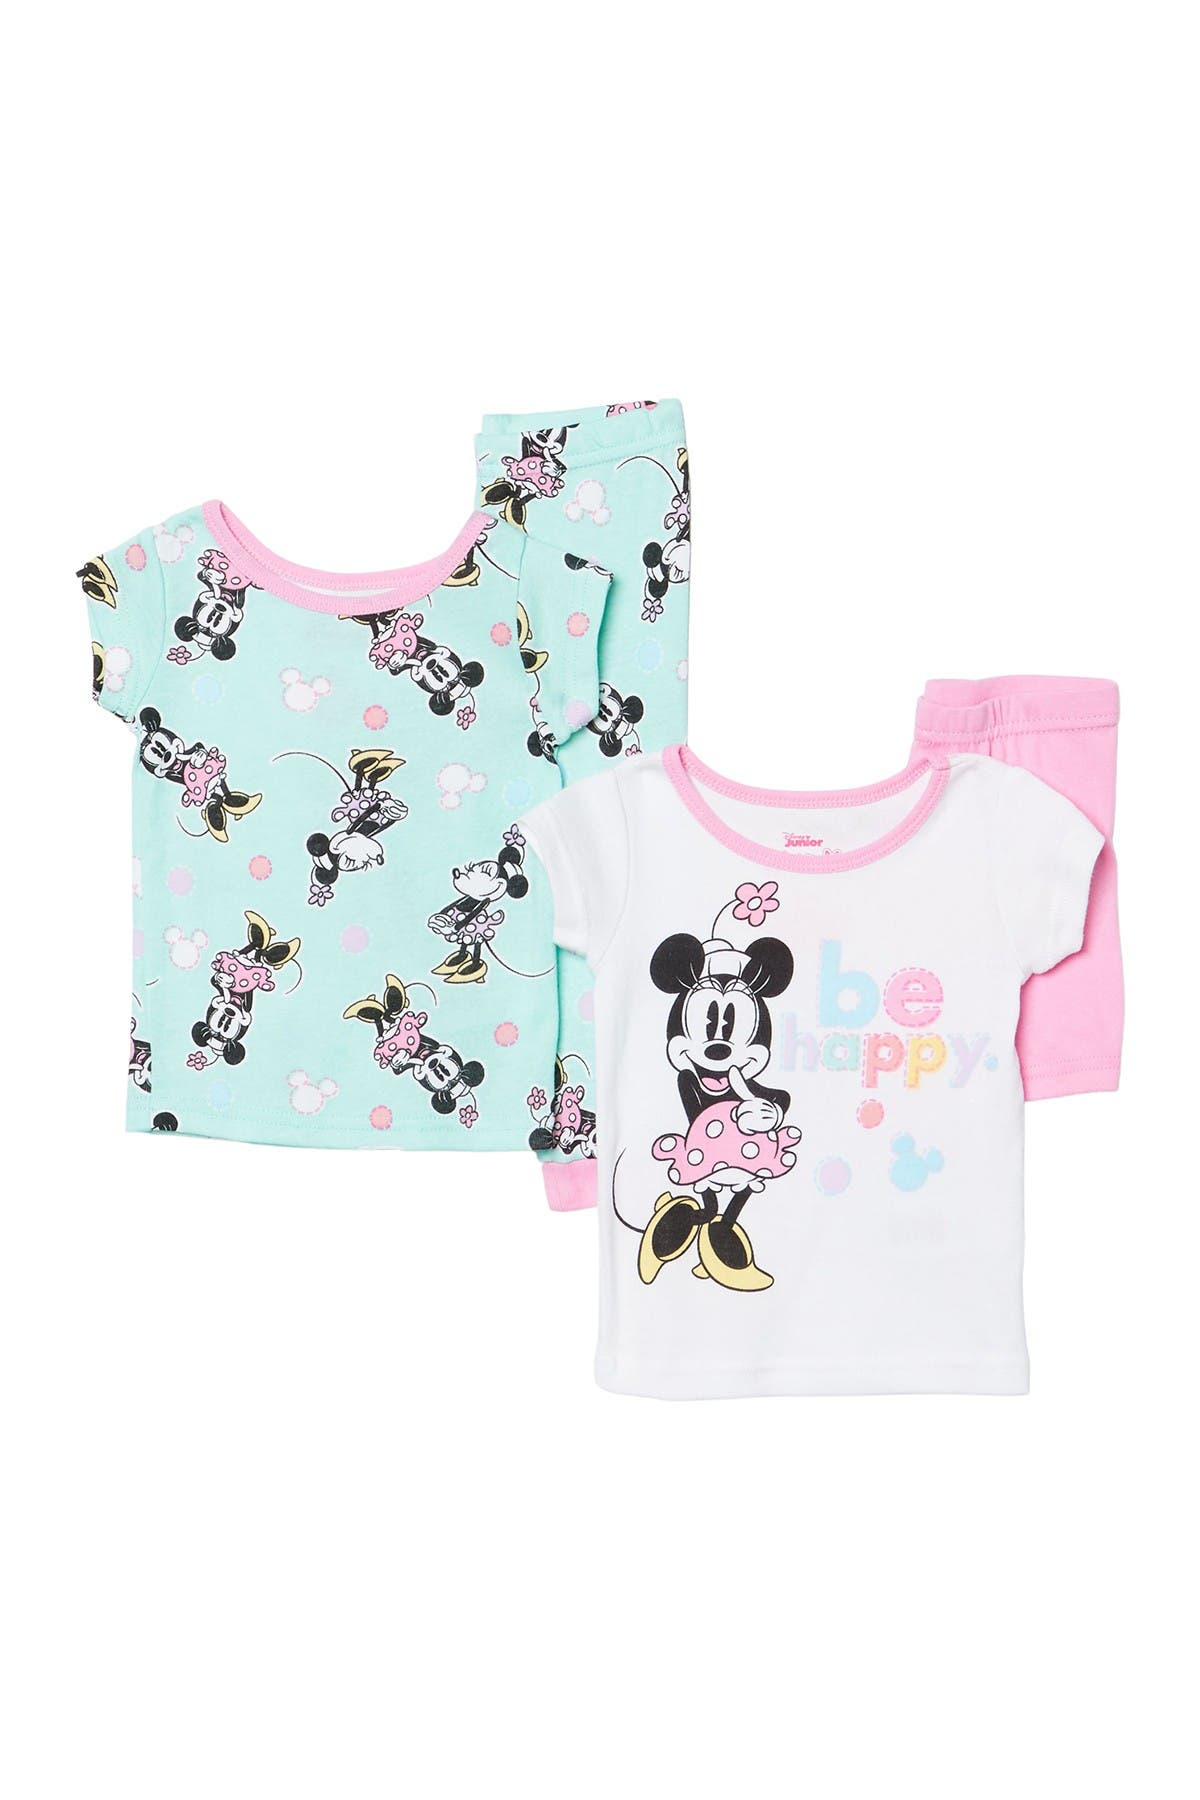 Image of AME Minnie Mouse Pajama Set - Set of 2